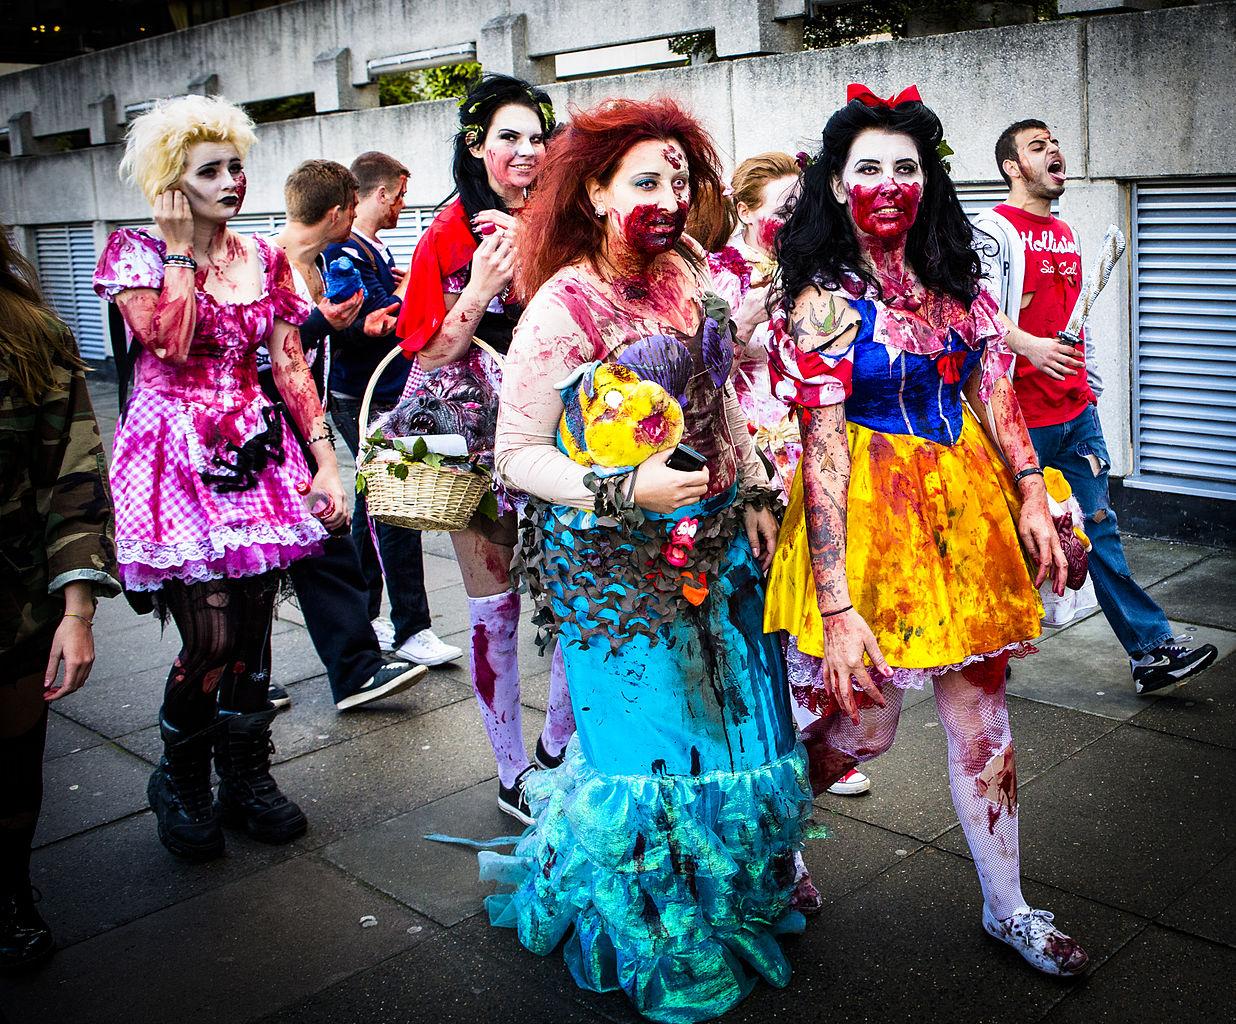 Zombie Little Mermaid Costume File:Snow White ^ Litt...